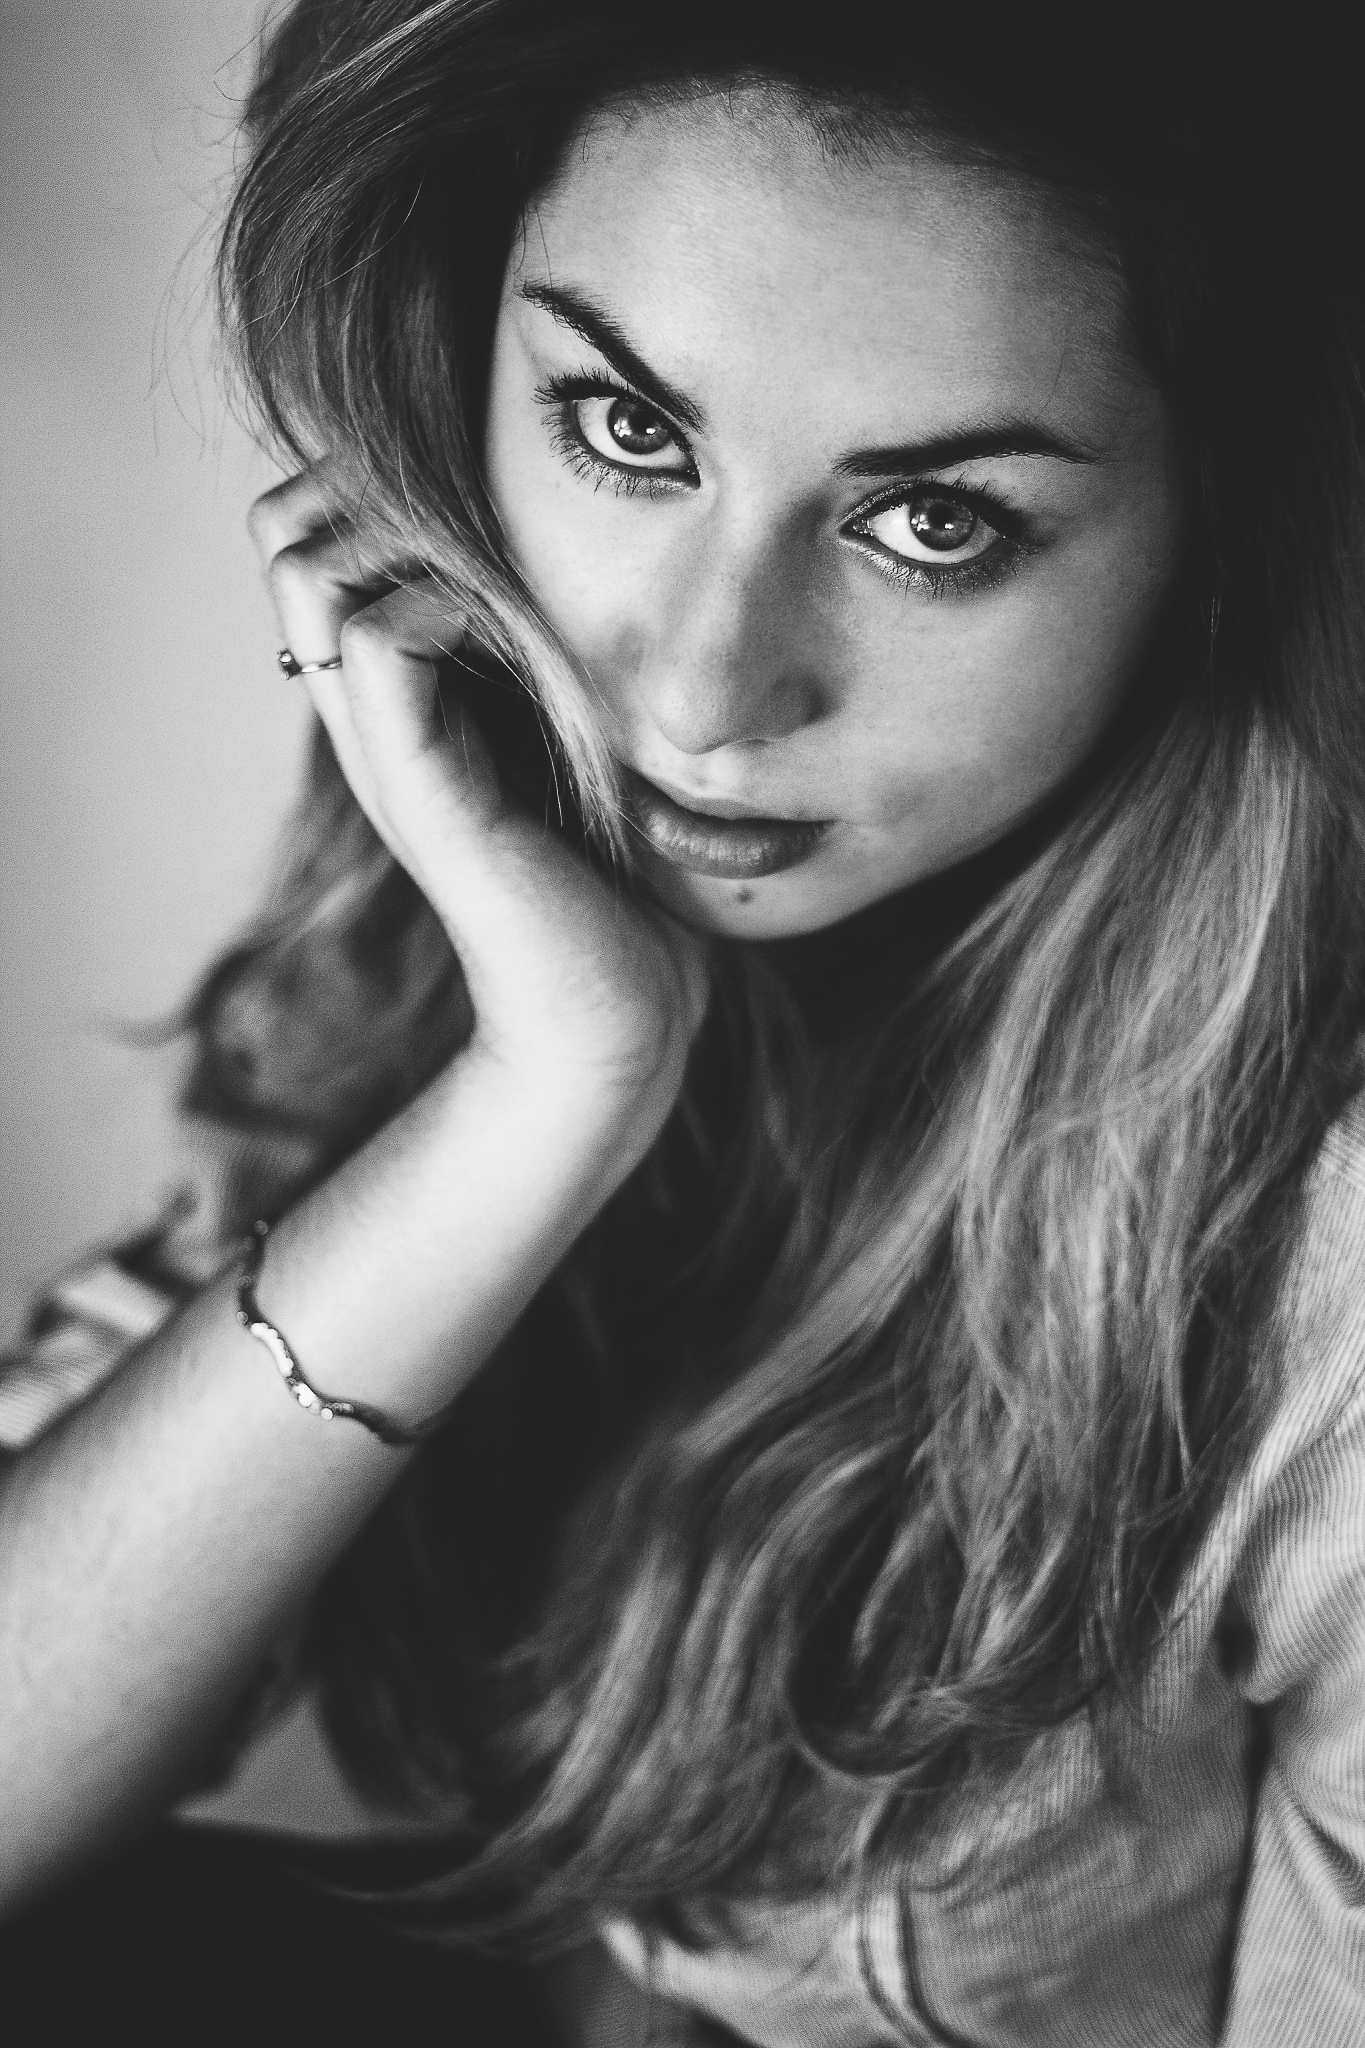 kubousfoto_fotograf_brno_portrait